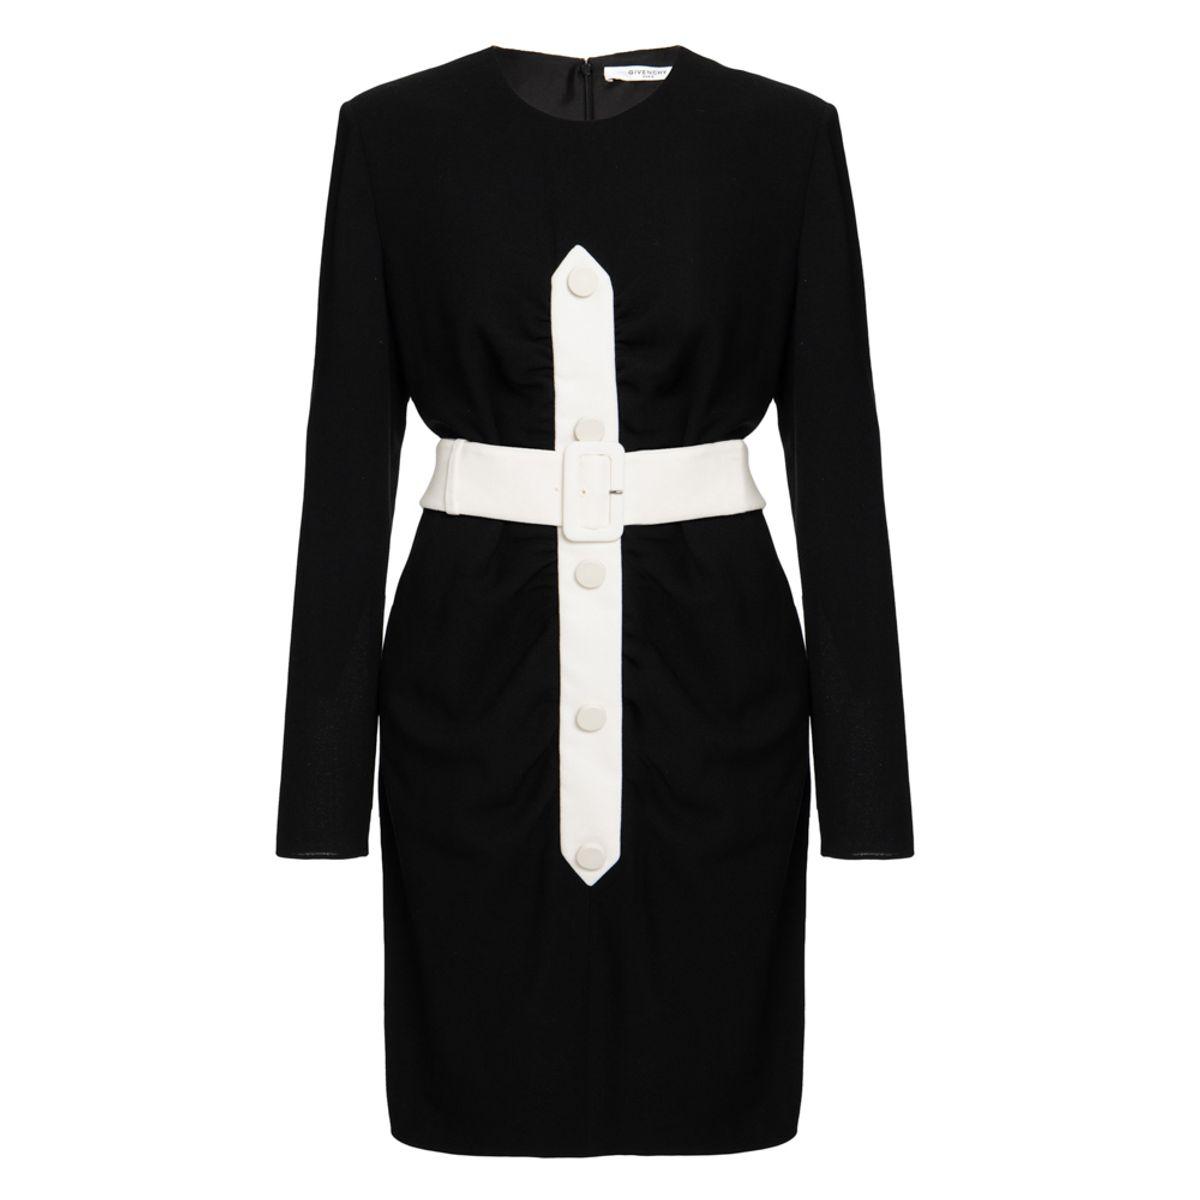 c4225a4829b Vestido Givenchy Cross - nkstore